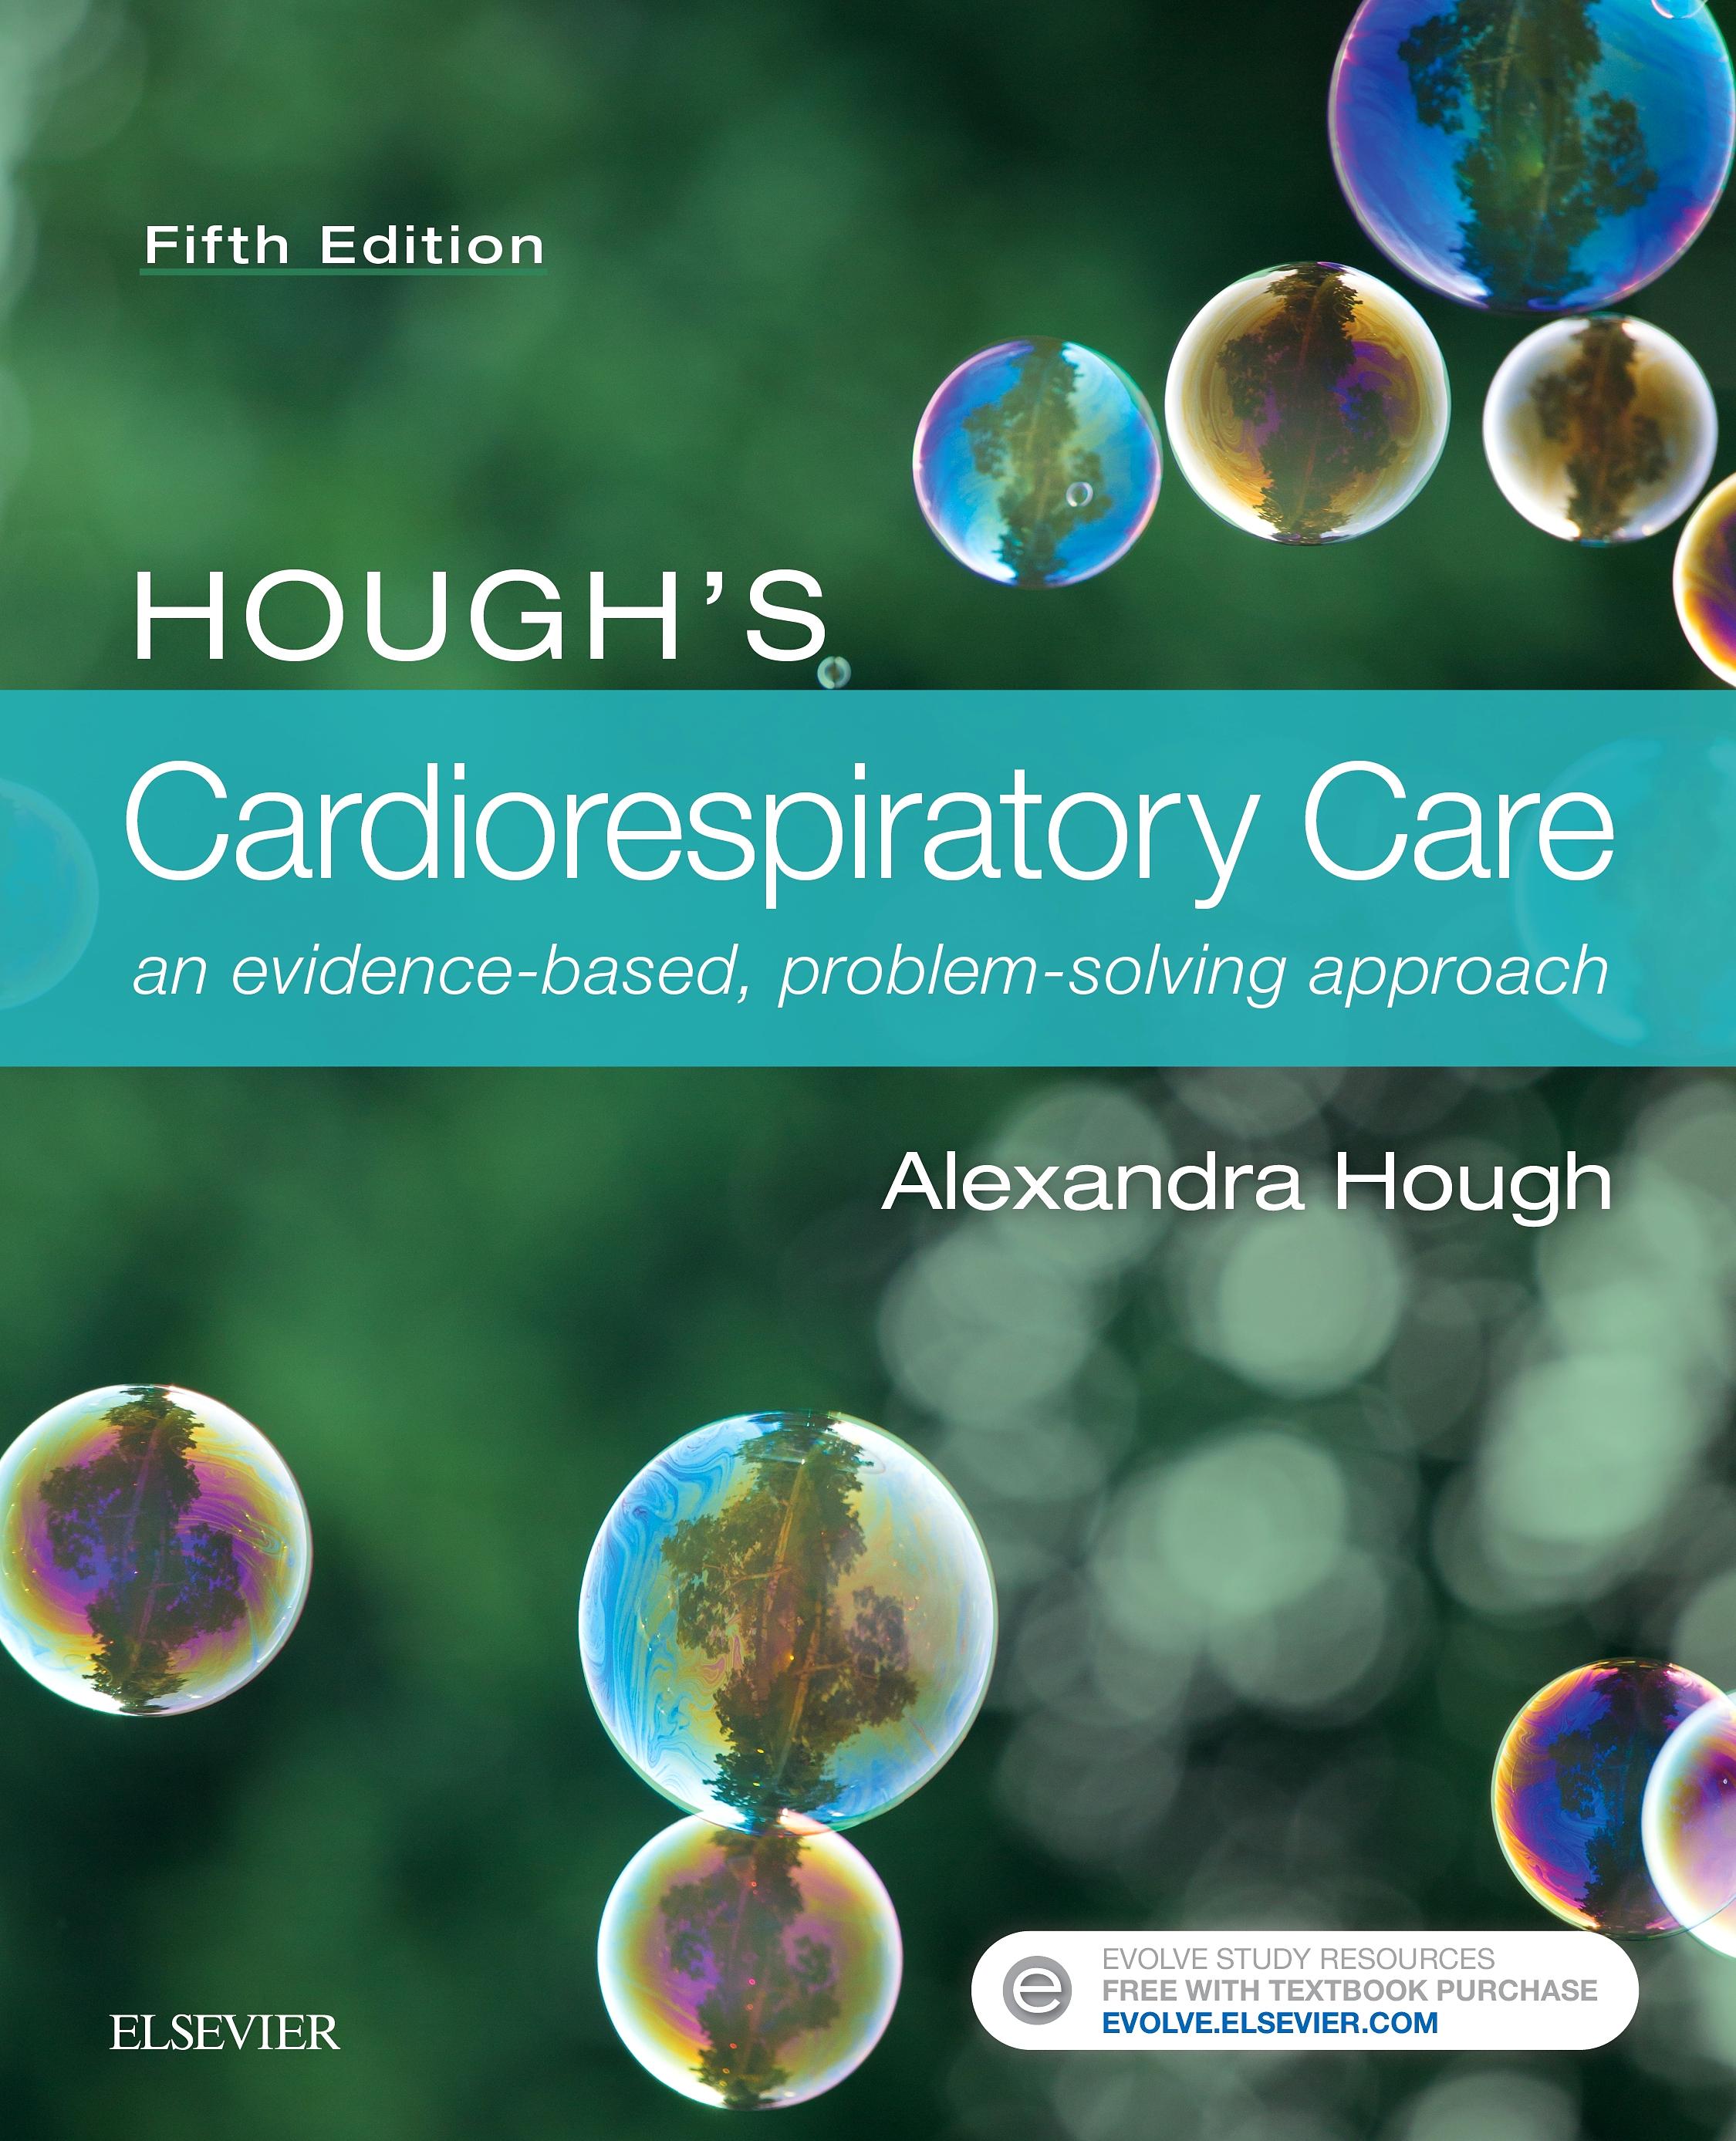 Evolve Resources for Hough's Cardiorespiratory Care, 5th Edition